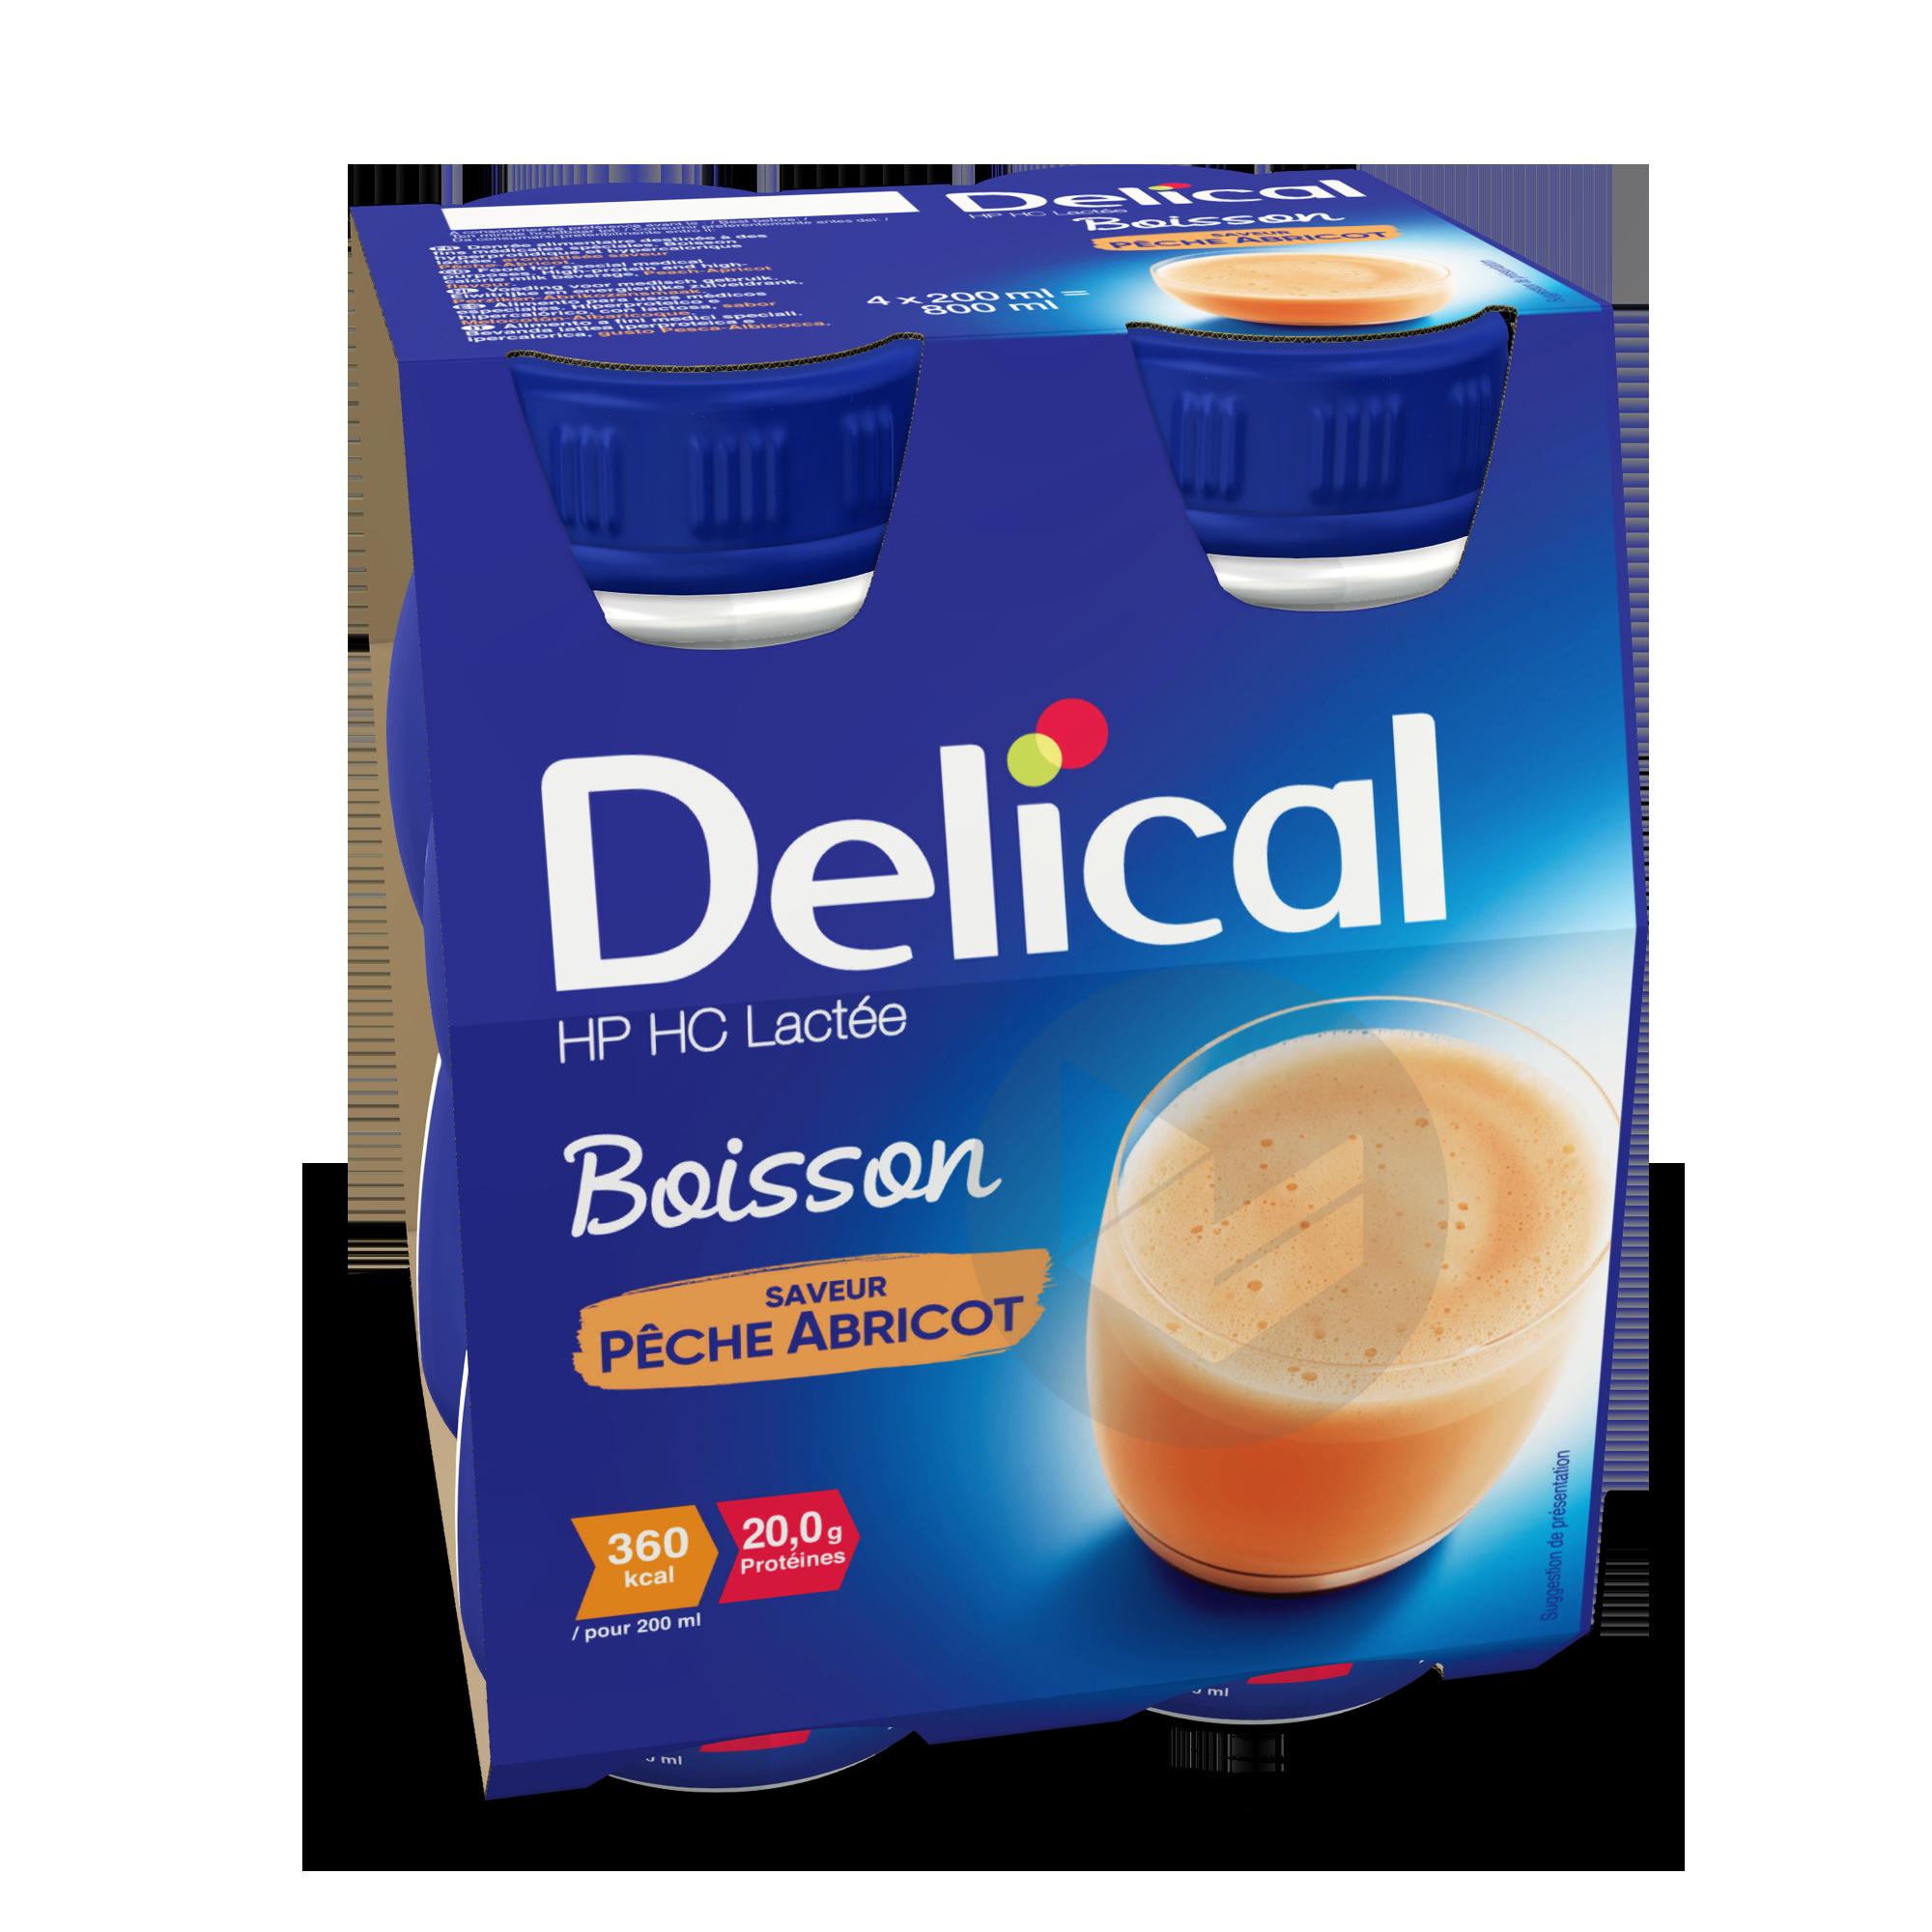 Delical Boisson Hp Hc Lactee Peche Abricot